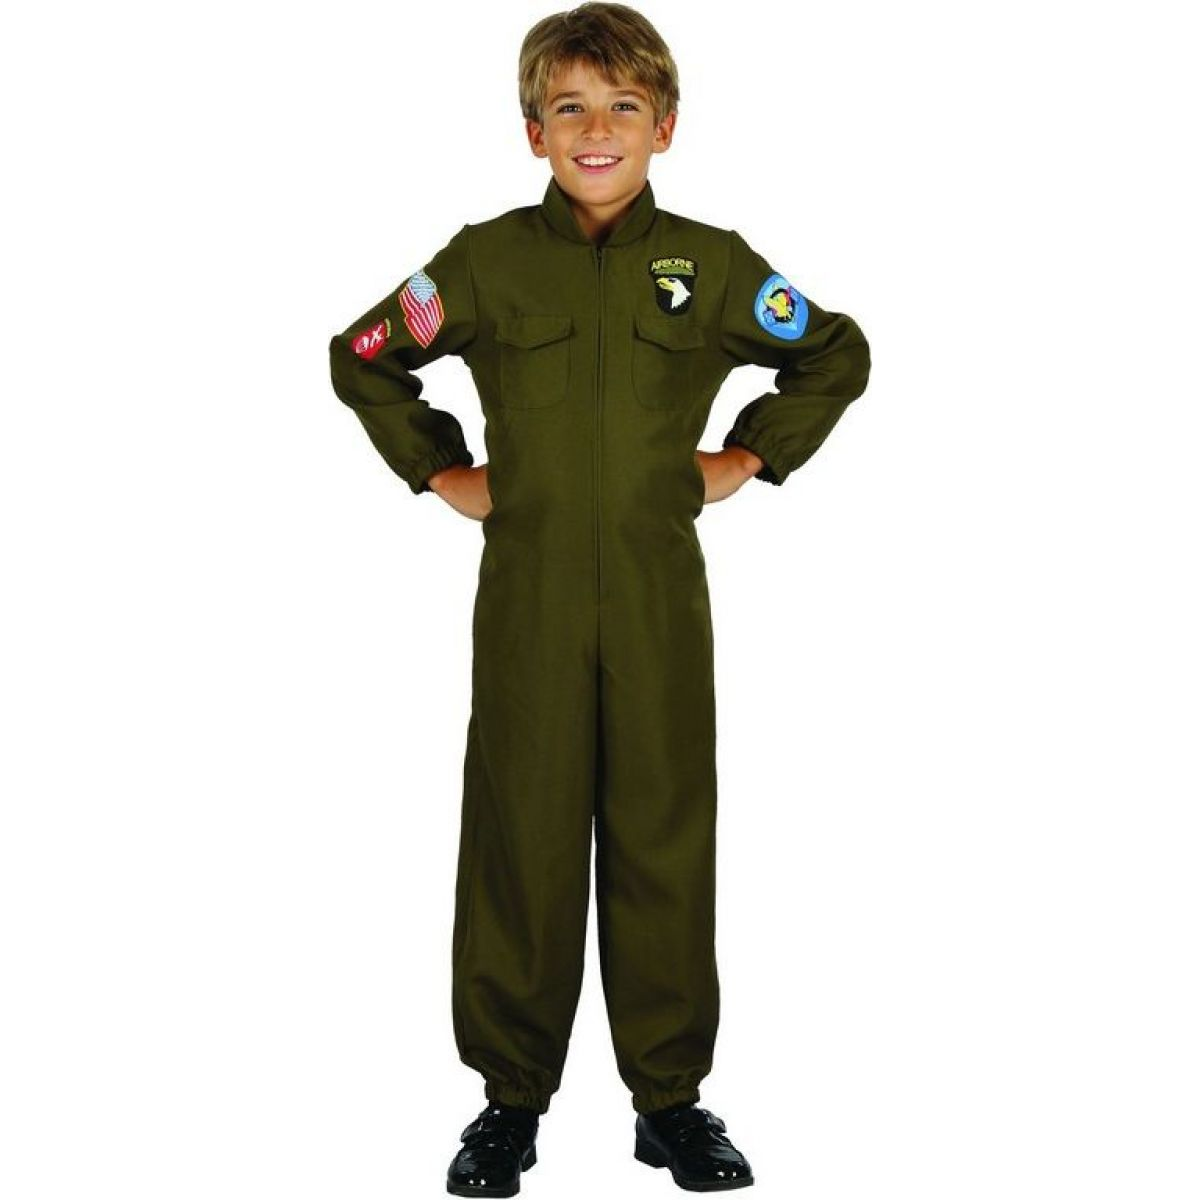 Dětský karnevalový kostým Pilot 130-140 cm